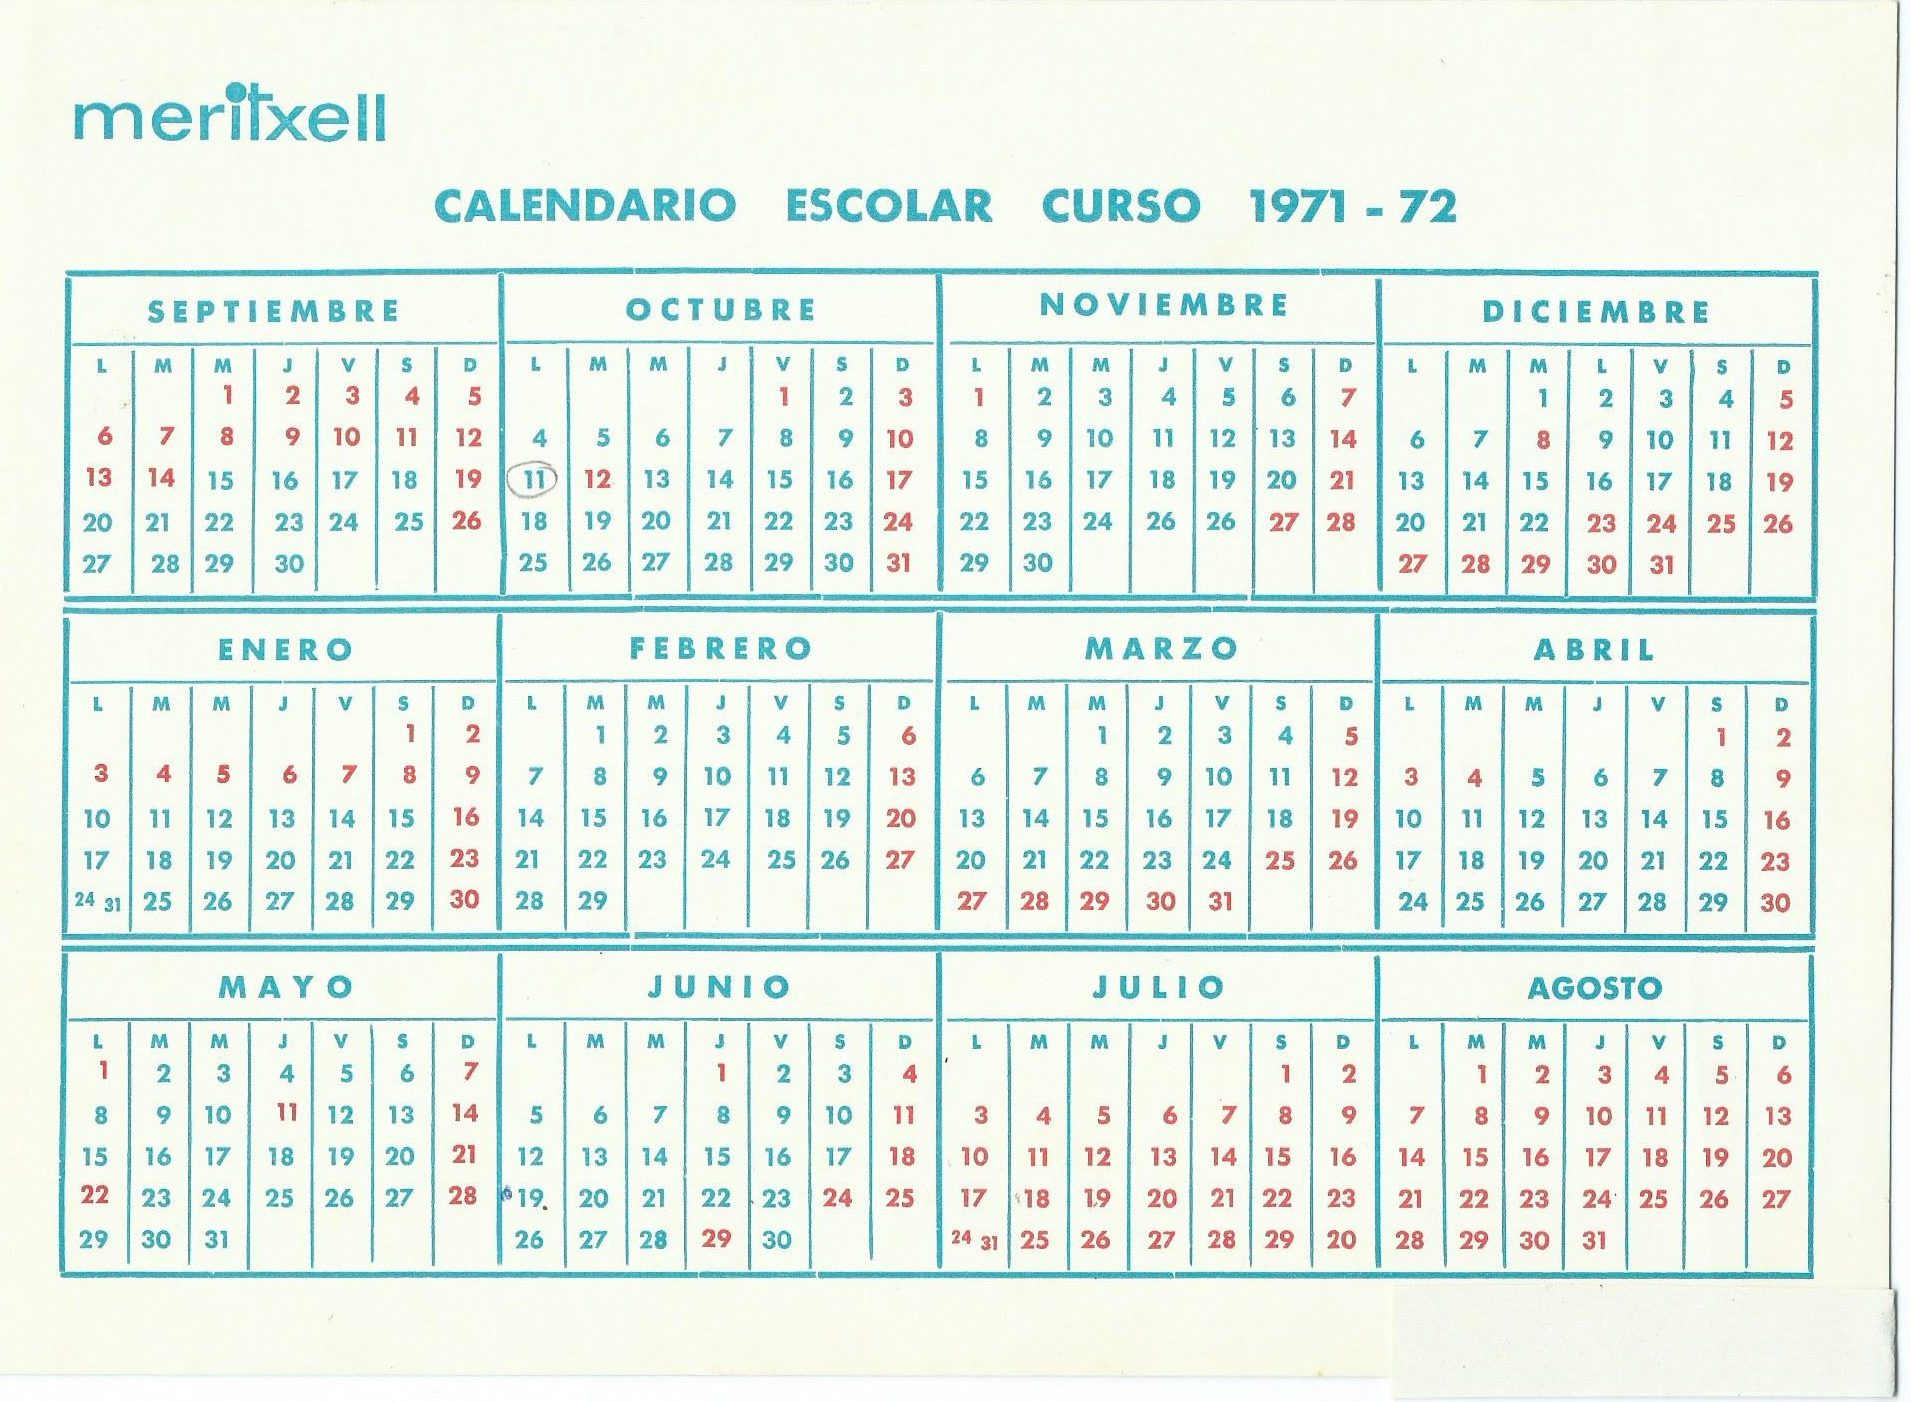 Calendari escolar curs 71-72 Escola Meritxell